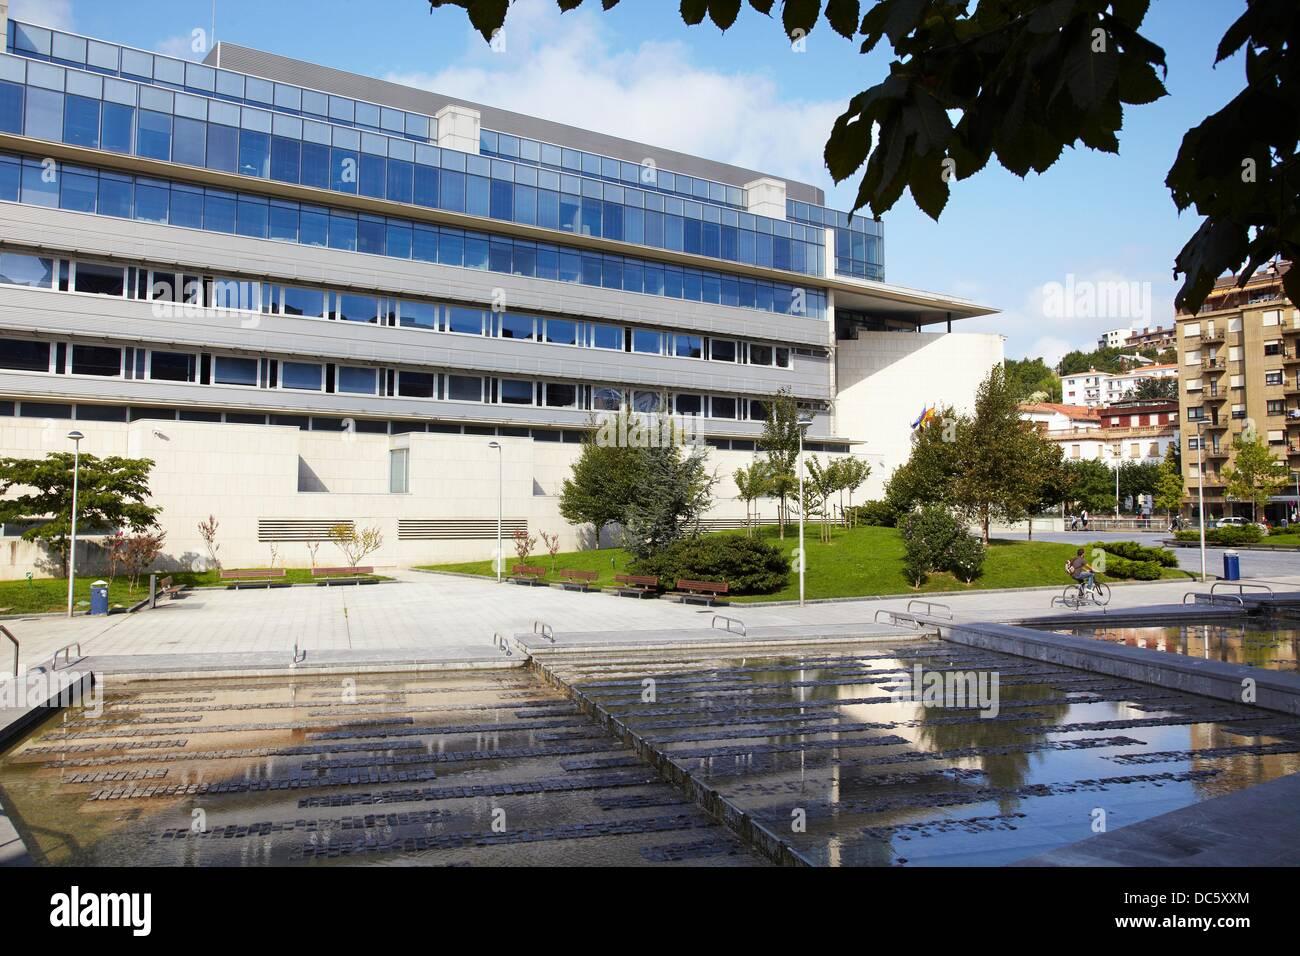 Couthouse, San Sebastian, Donostia, Gipuzkoa, Basque Country, Spain - Stock Image